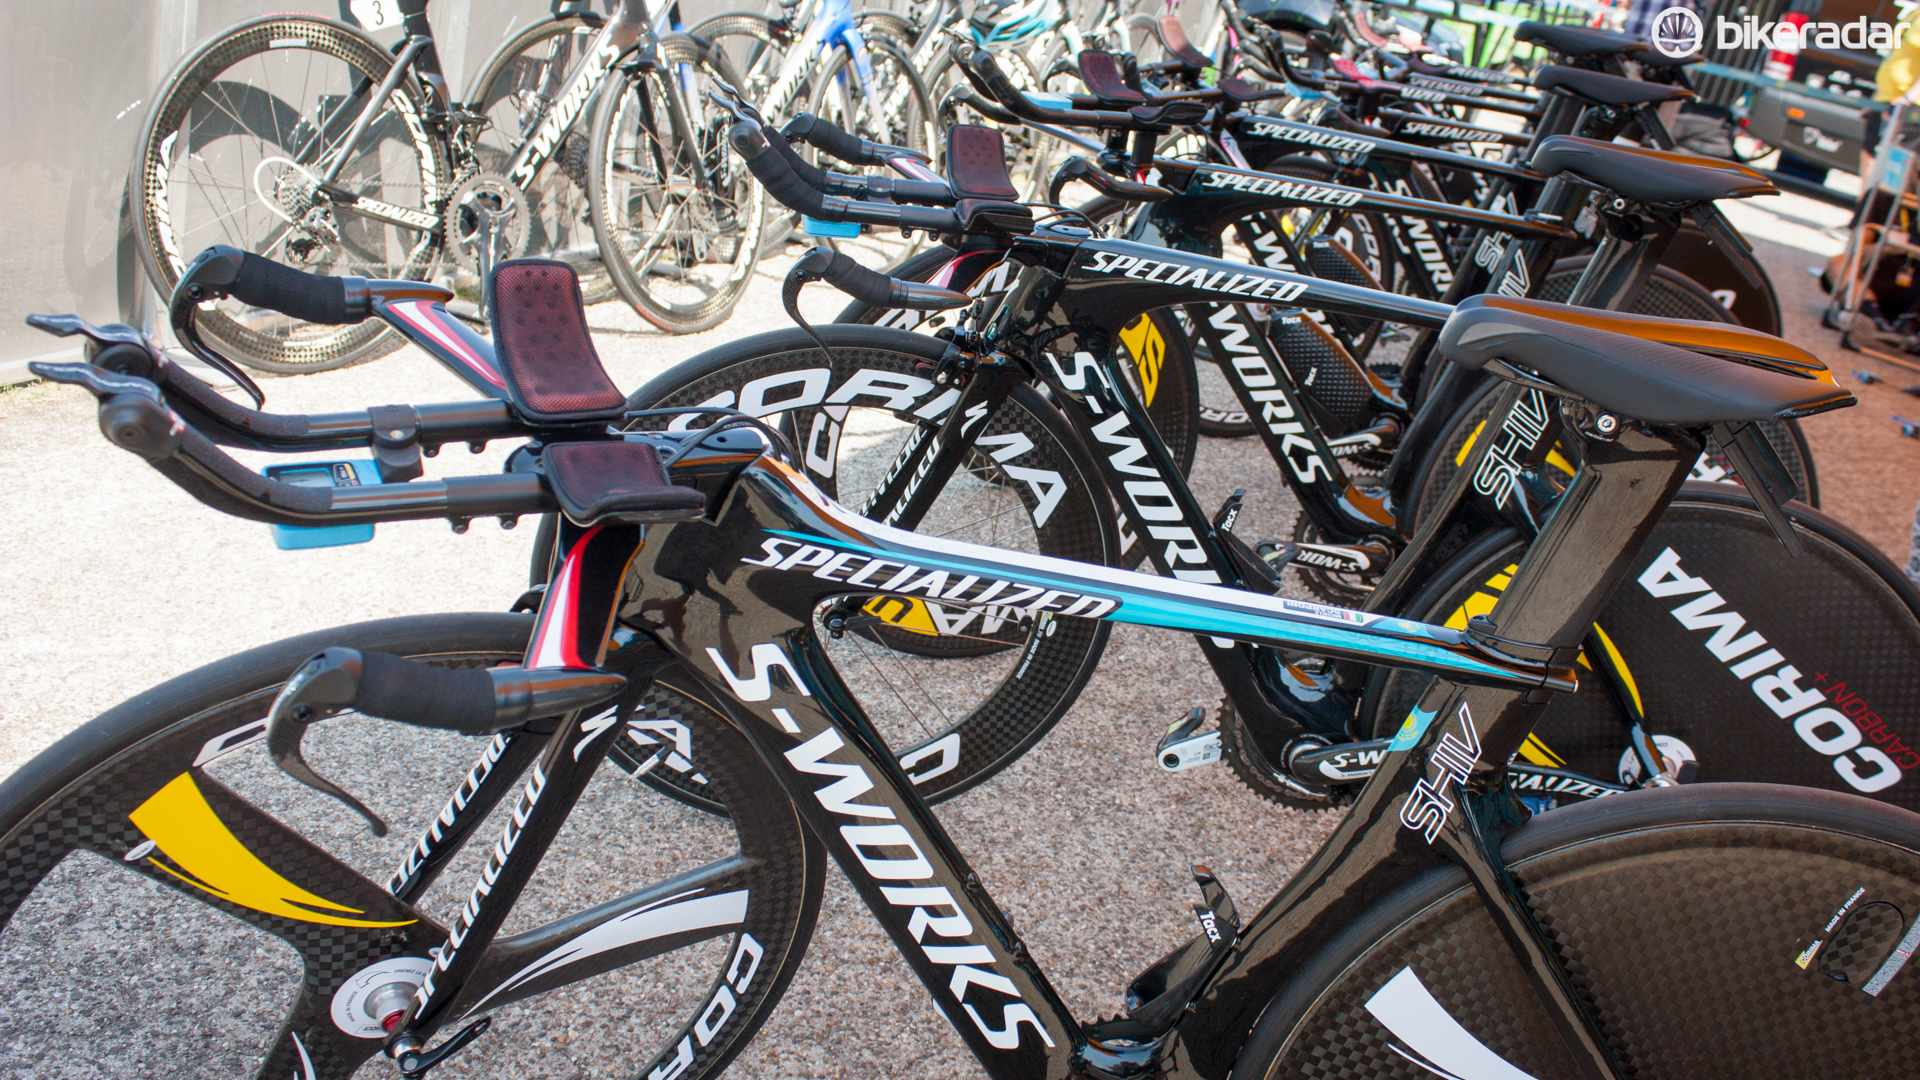 A few of Astana's Specialized Shiv TT bikes featured a custom Astana paint job